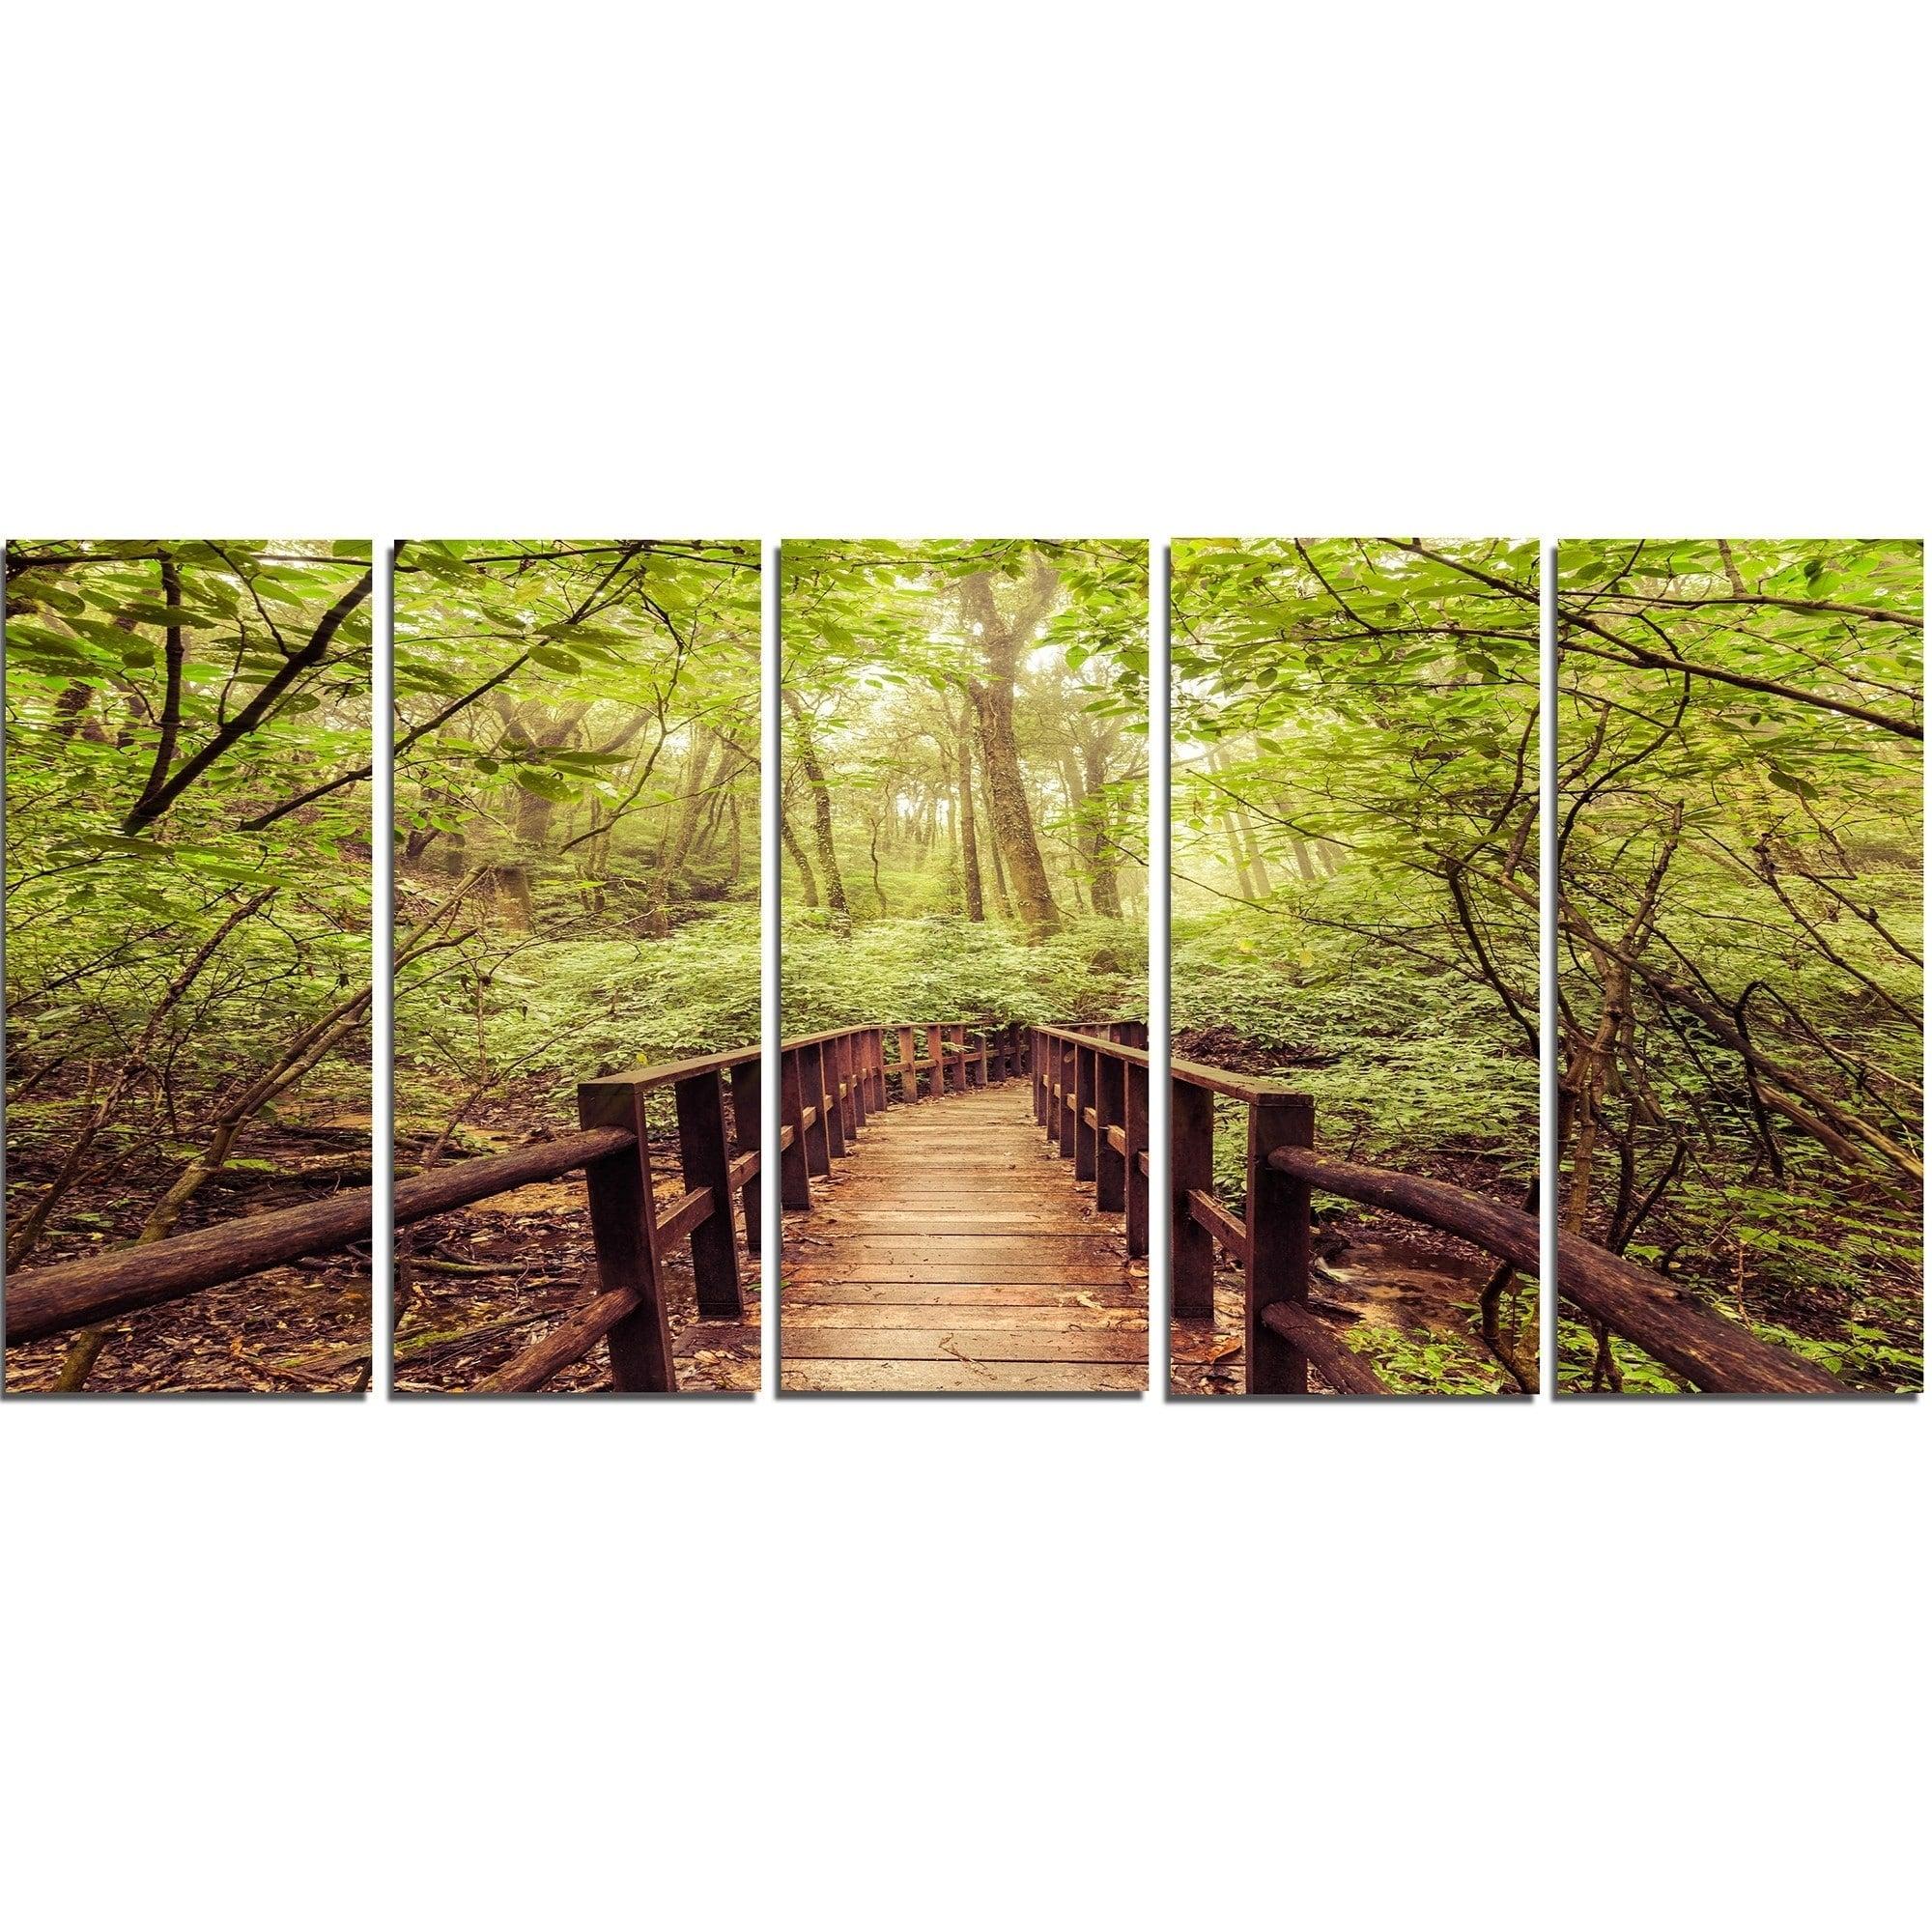 Designart \'Jungle in Vintage Style\' Landscape Photo Metal Wall Art ...